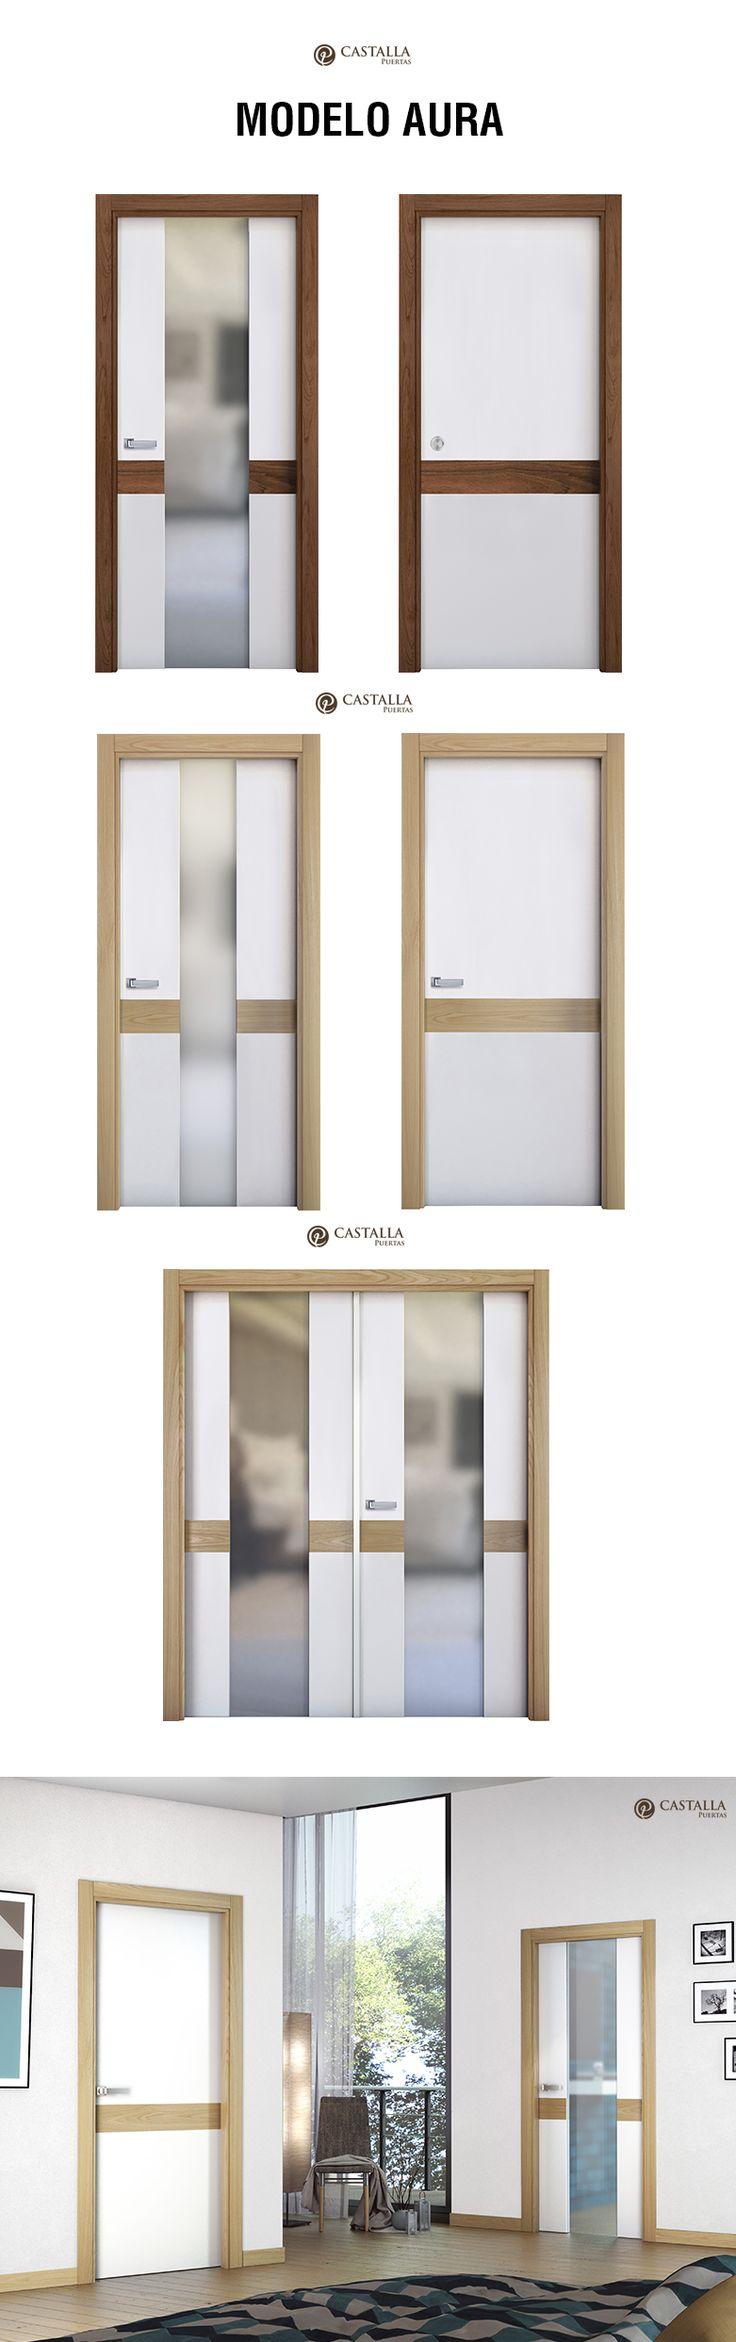 Puerta de interior con cristal Modelo AURA. Puertas Castalla | glass interior door model AURA. CAstalla Doors